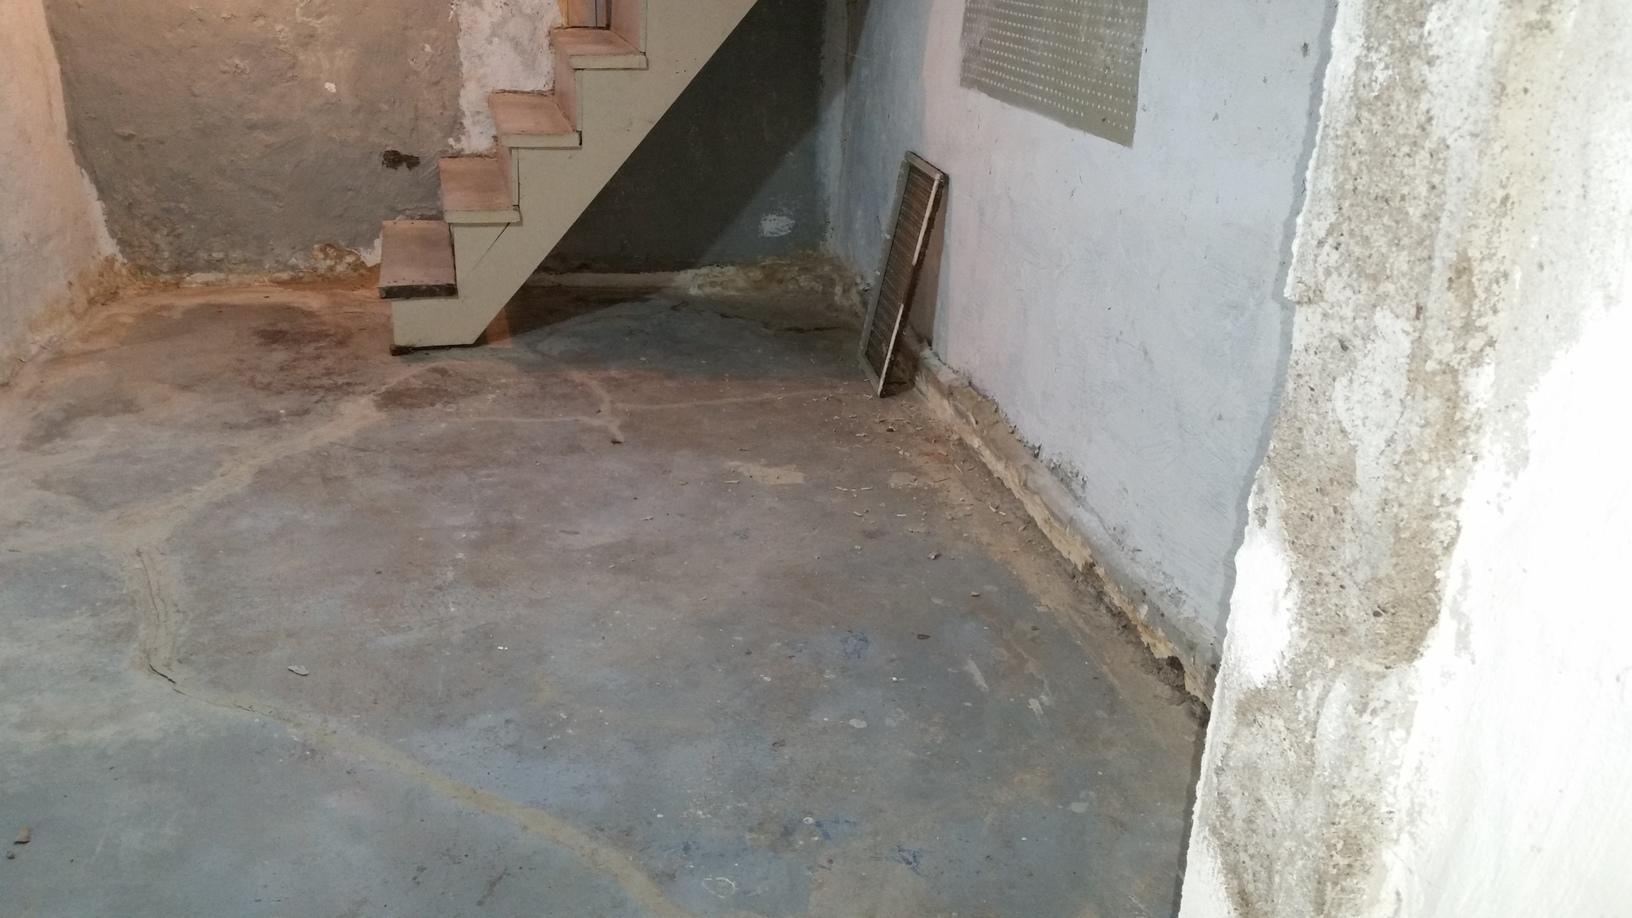 The basement had leaks along the perimeter of the basement.